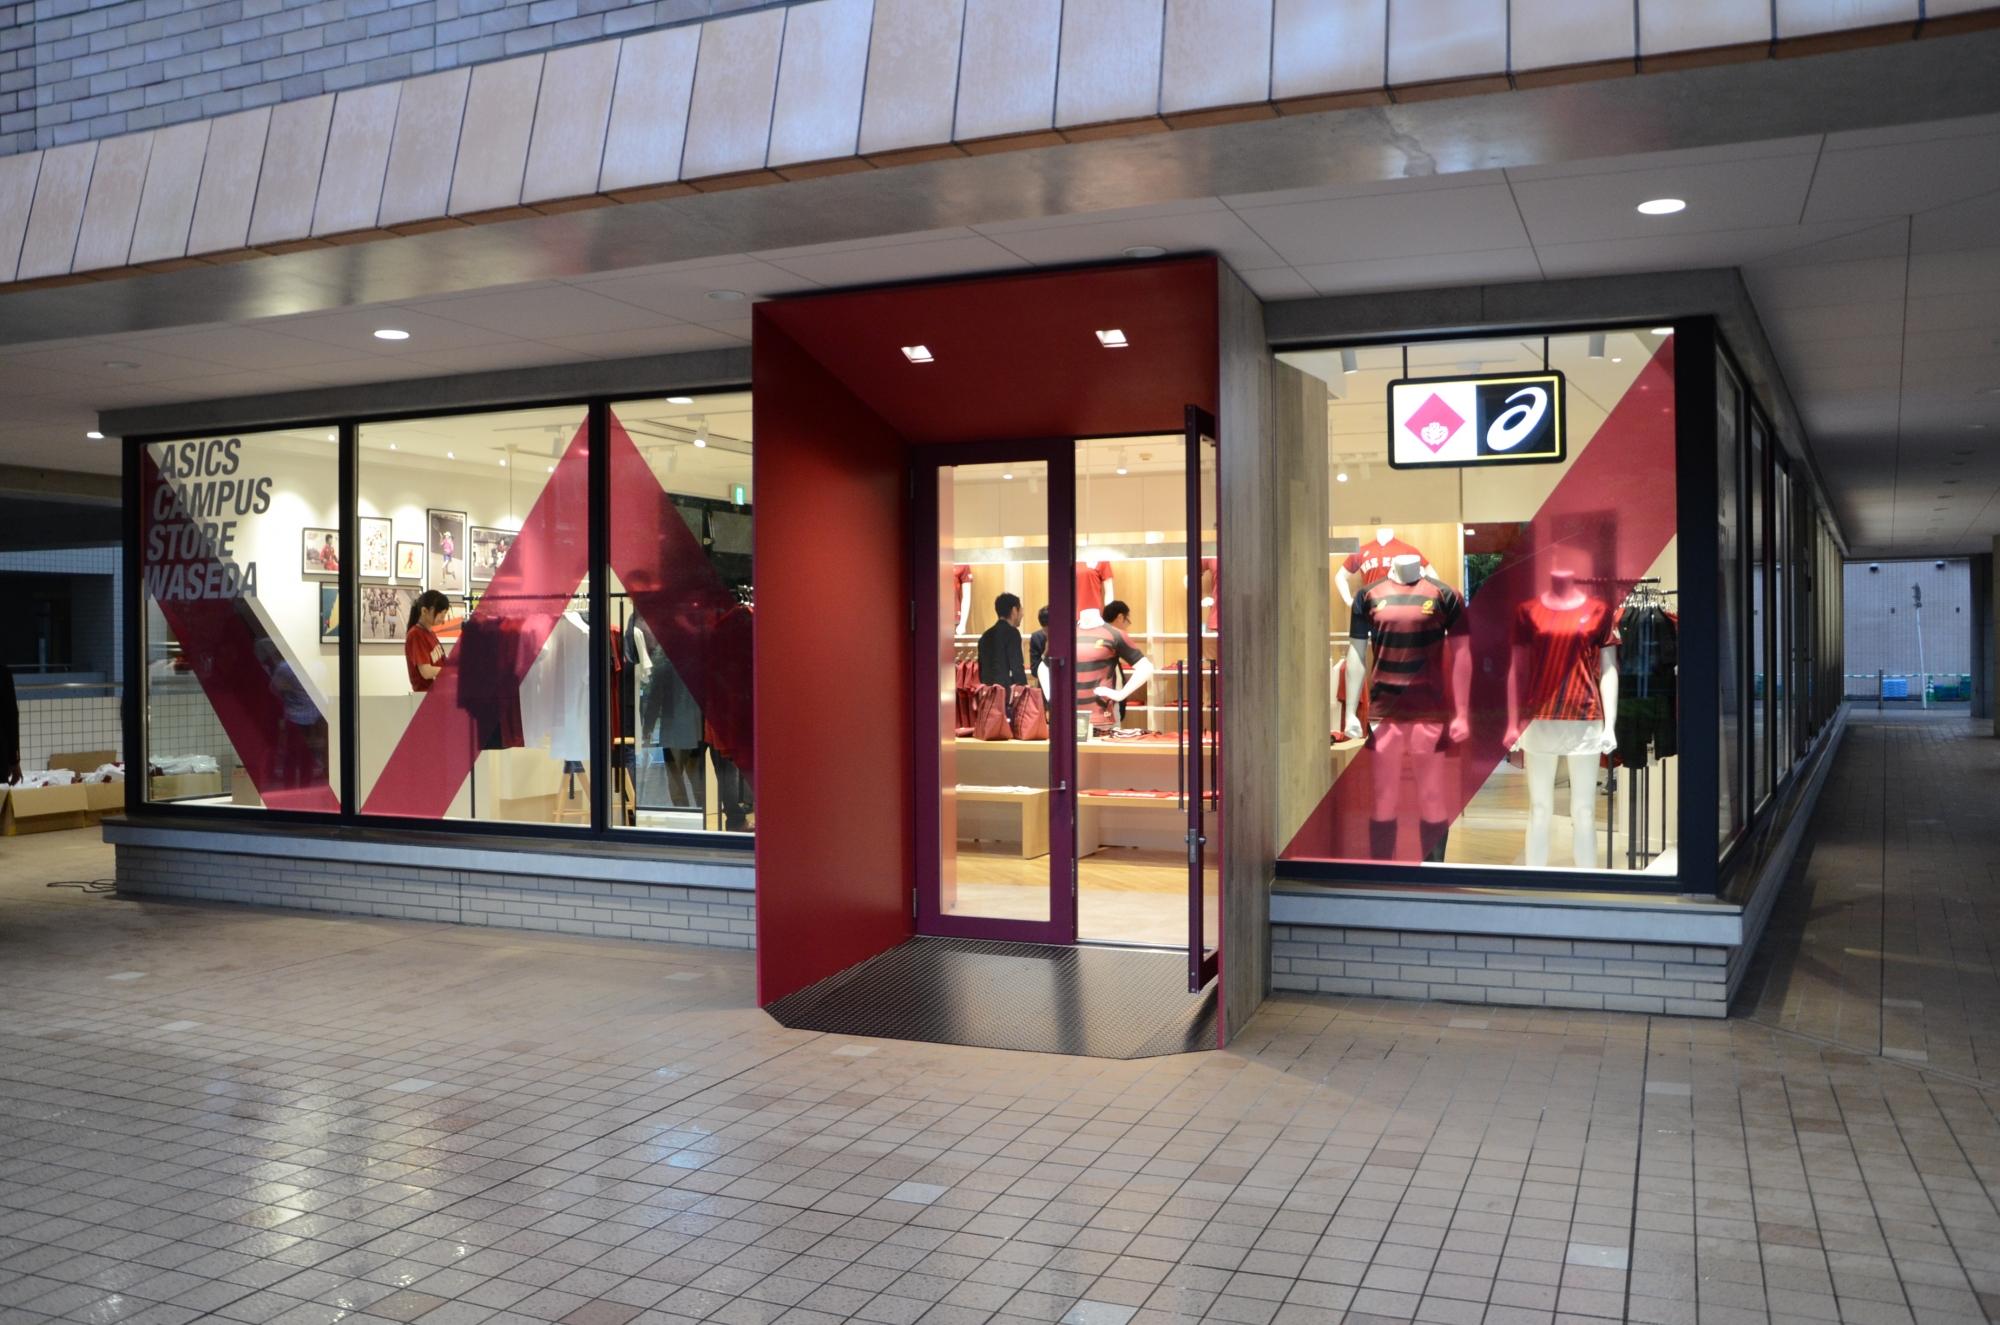 e11fb0a27af3 ASICS CAMPUS STORE WASEDA now open – Waseda University